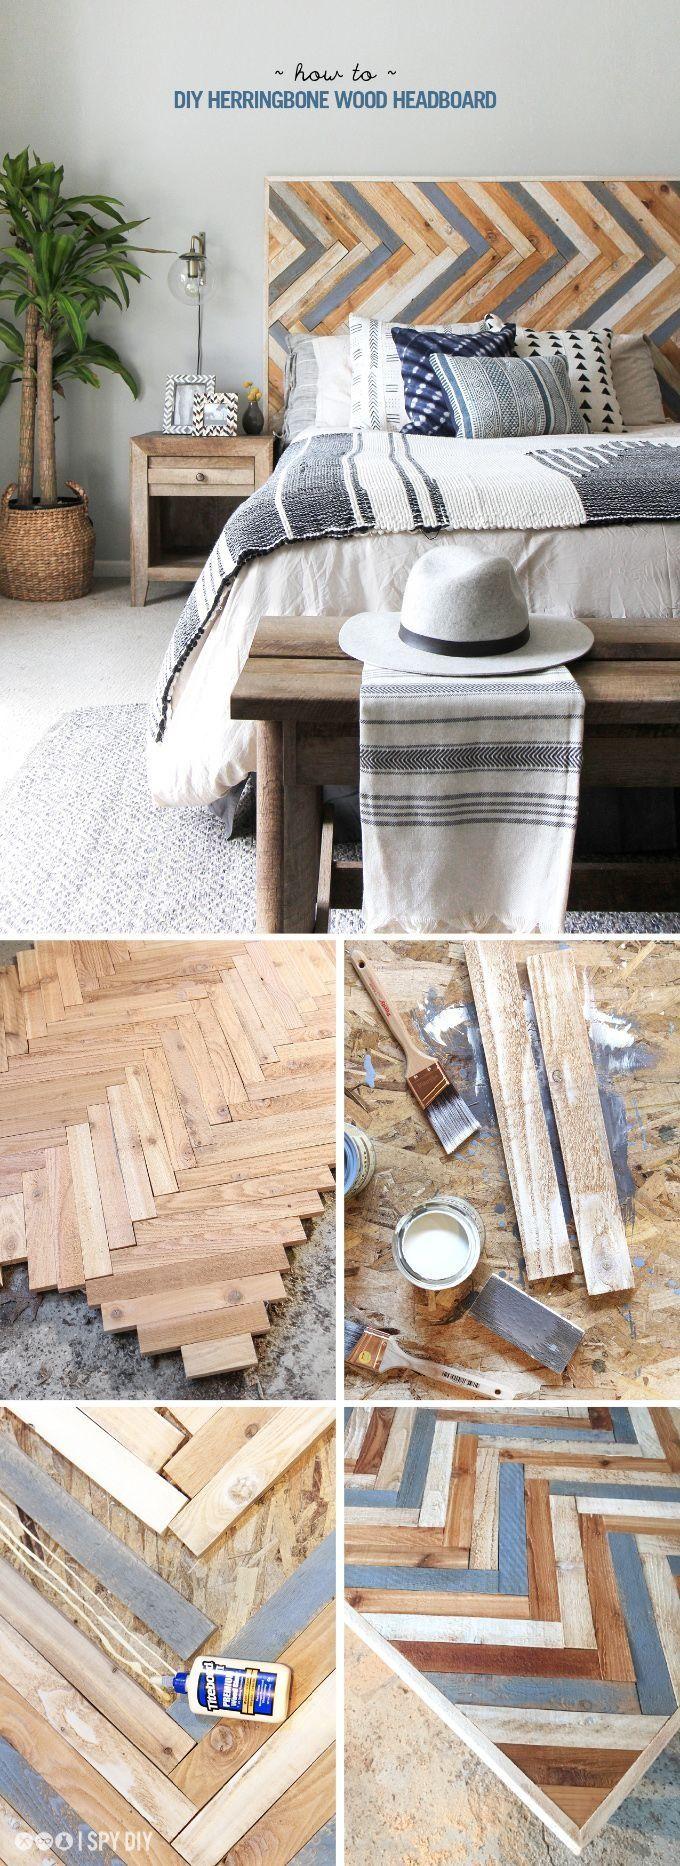 create a custom headboard in a weekend with some wood and stain get started on diy kopfteilegemtliches - Diy Knigin Kopfteilplne